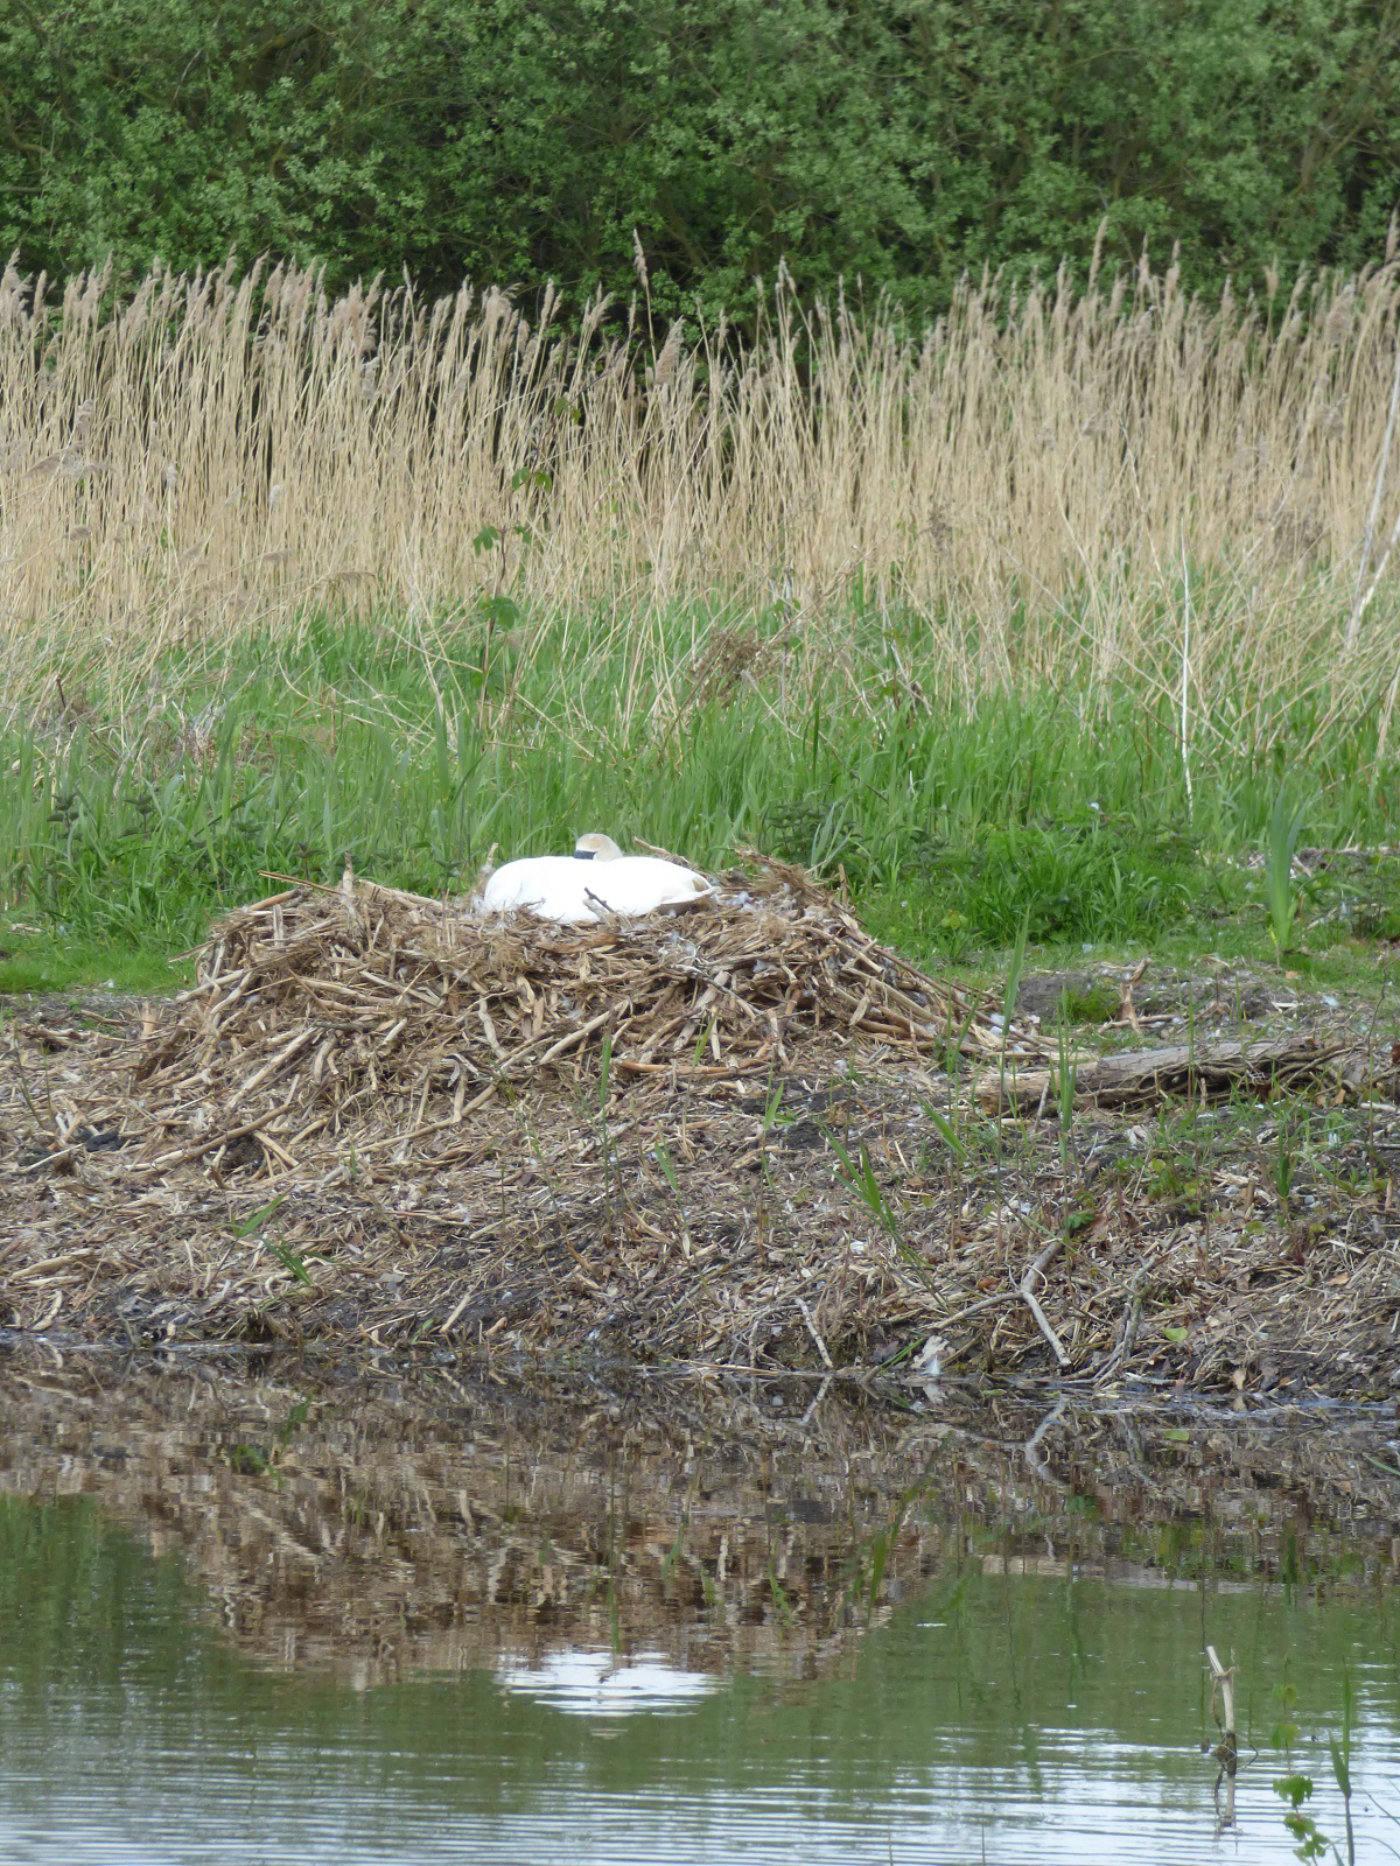 Nesting swan in Surlingham